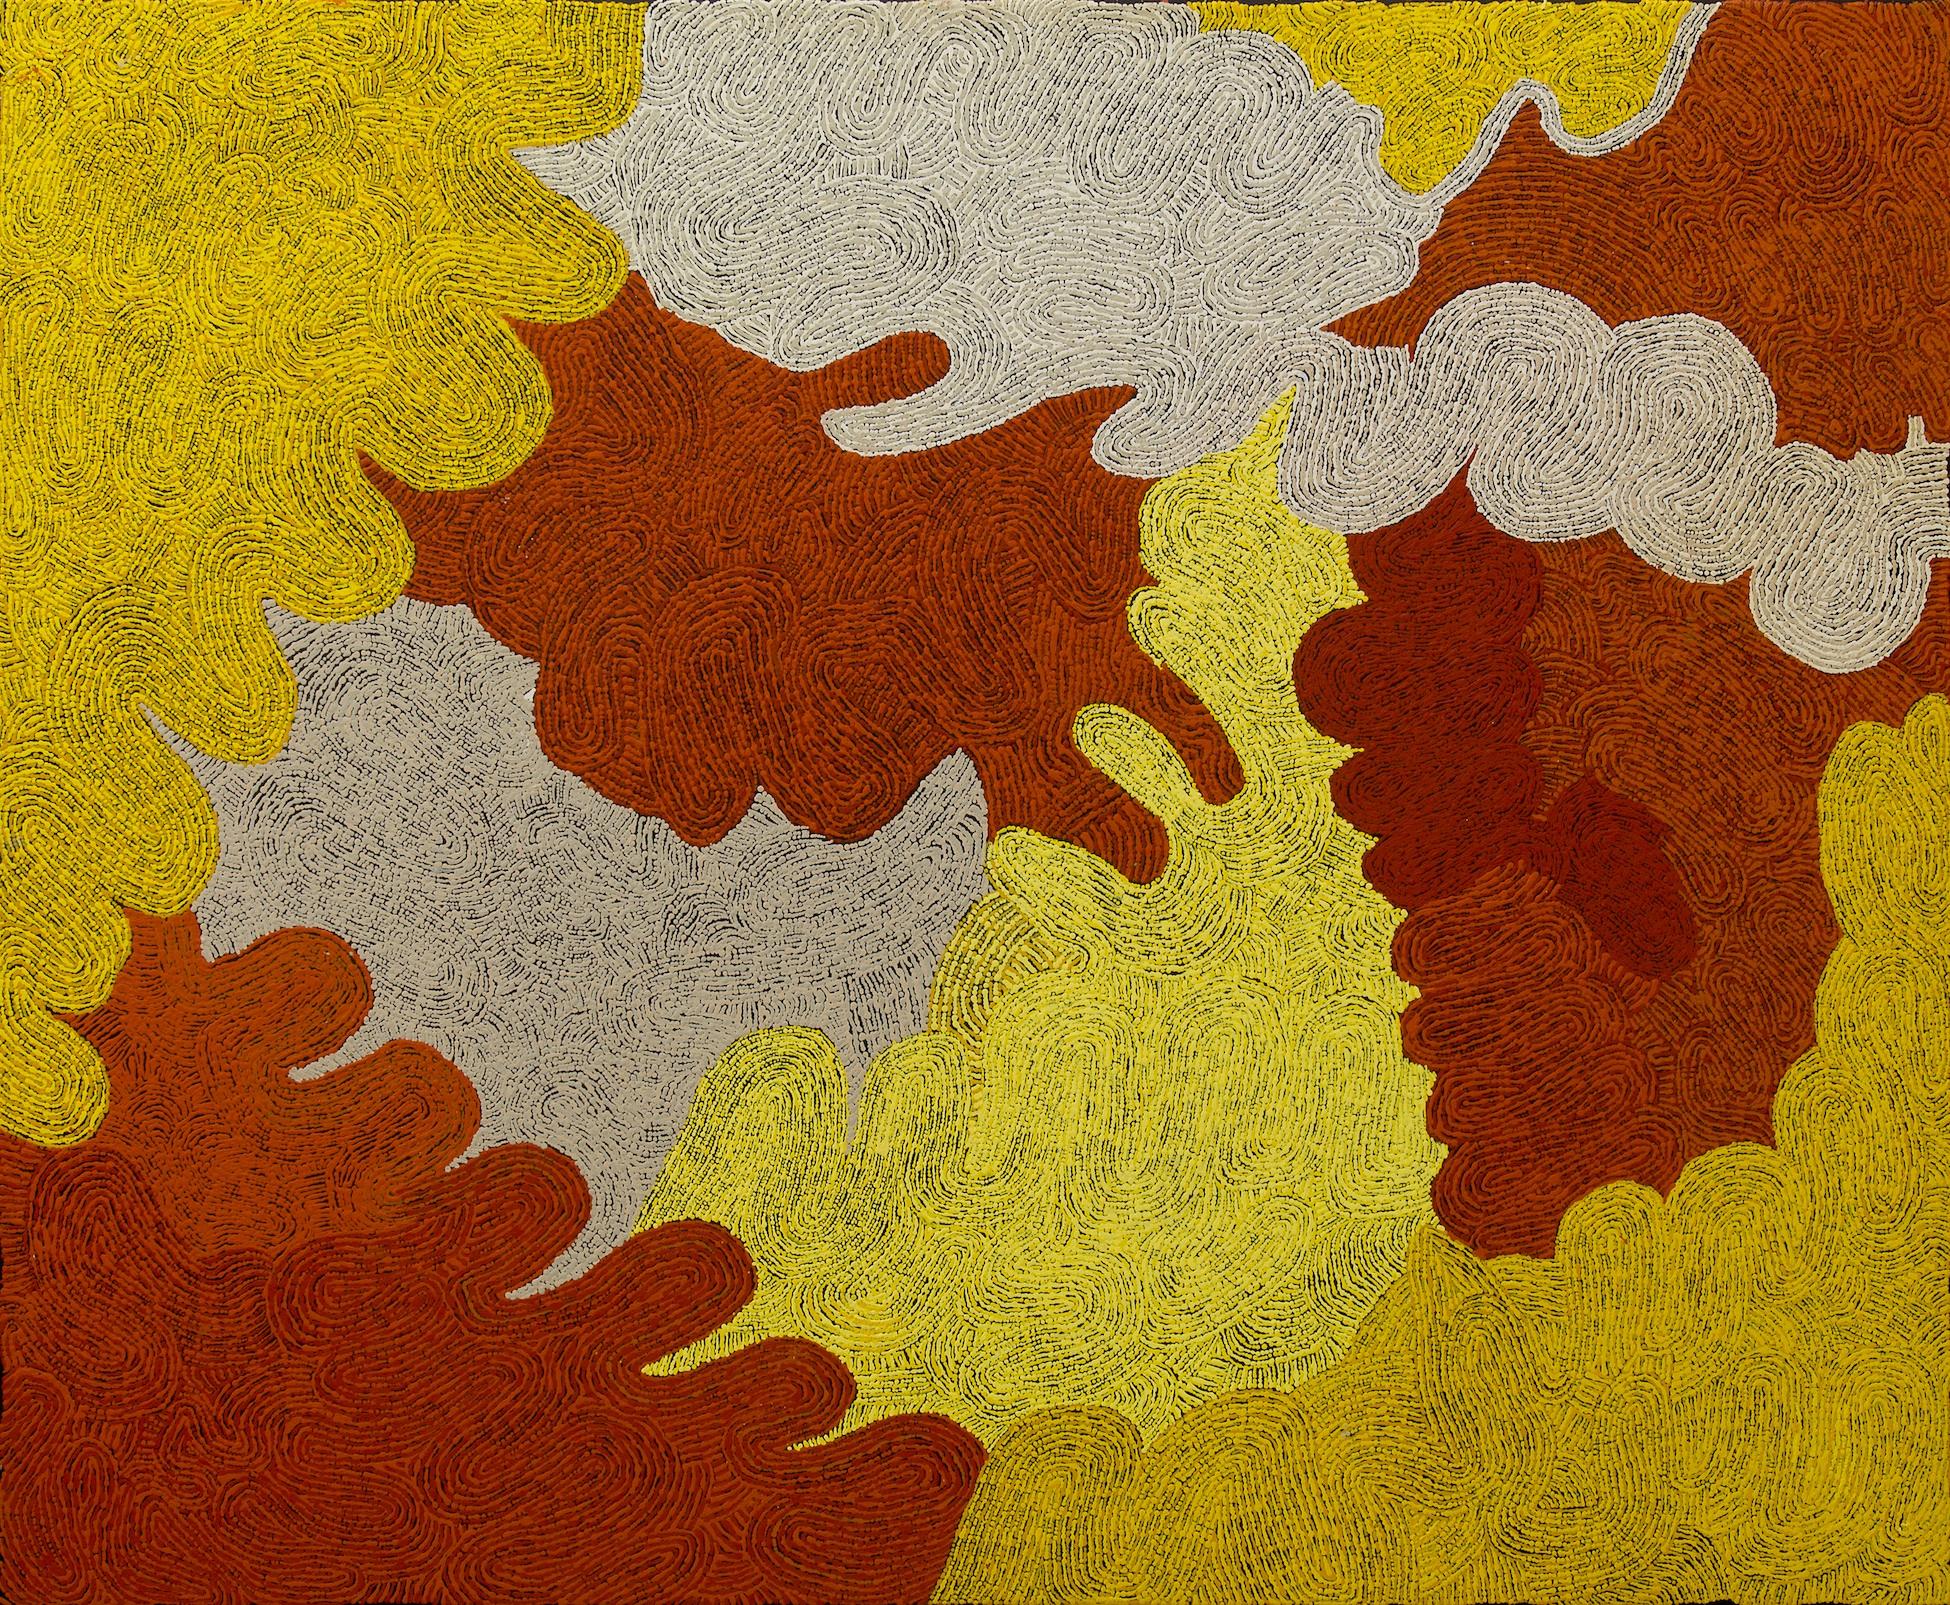 "Carlene Thompson  Kalaya ngura  Acrylic on canvas 39"" x 48"" (100 x 122 cm) Catalog #472-14   Price Available upon Request"